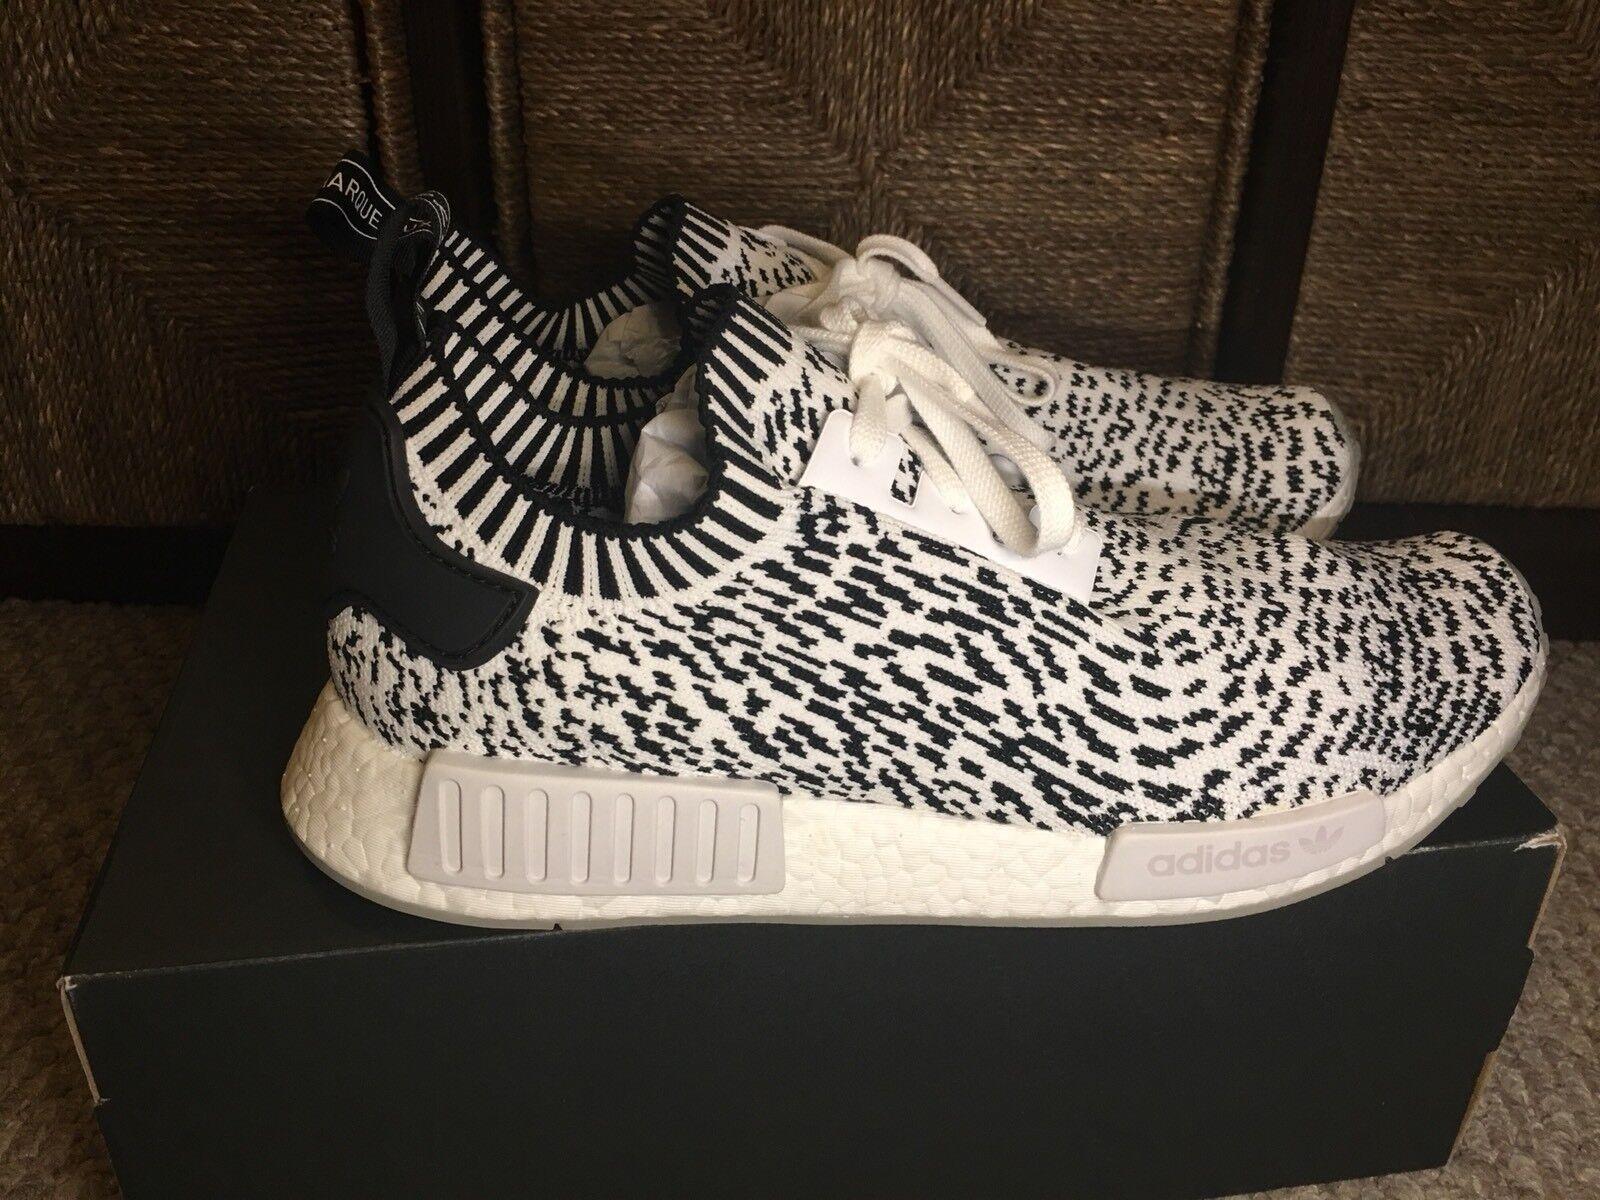 Adidas NMD R1 Primeknit Zebra Mens BZ0219 White Black Running Shoes Size 12